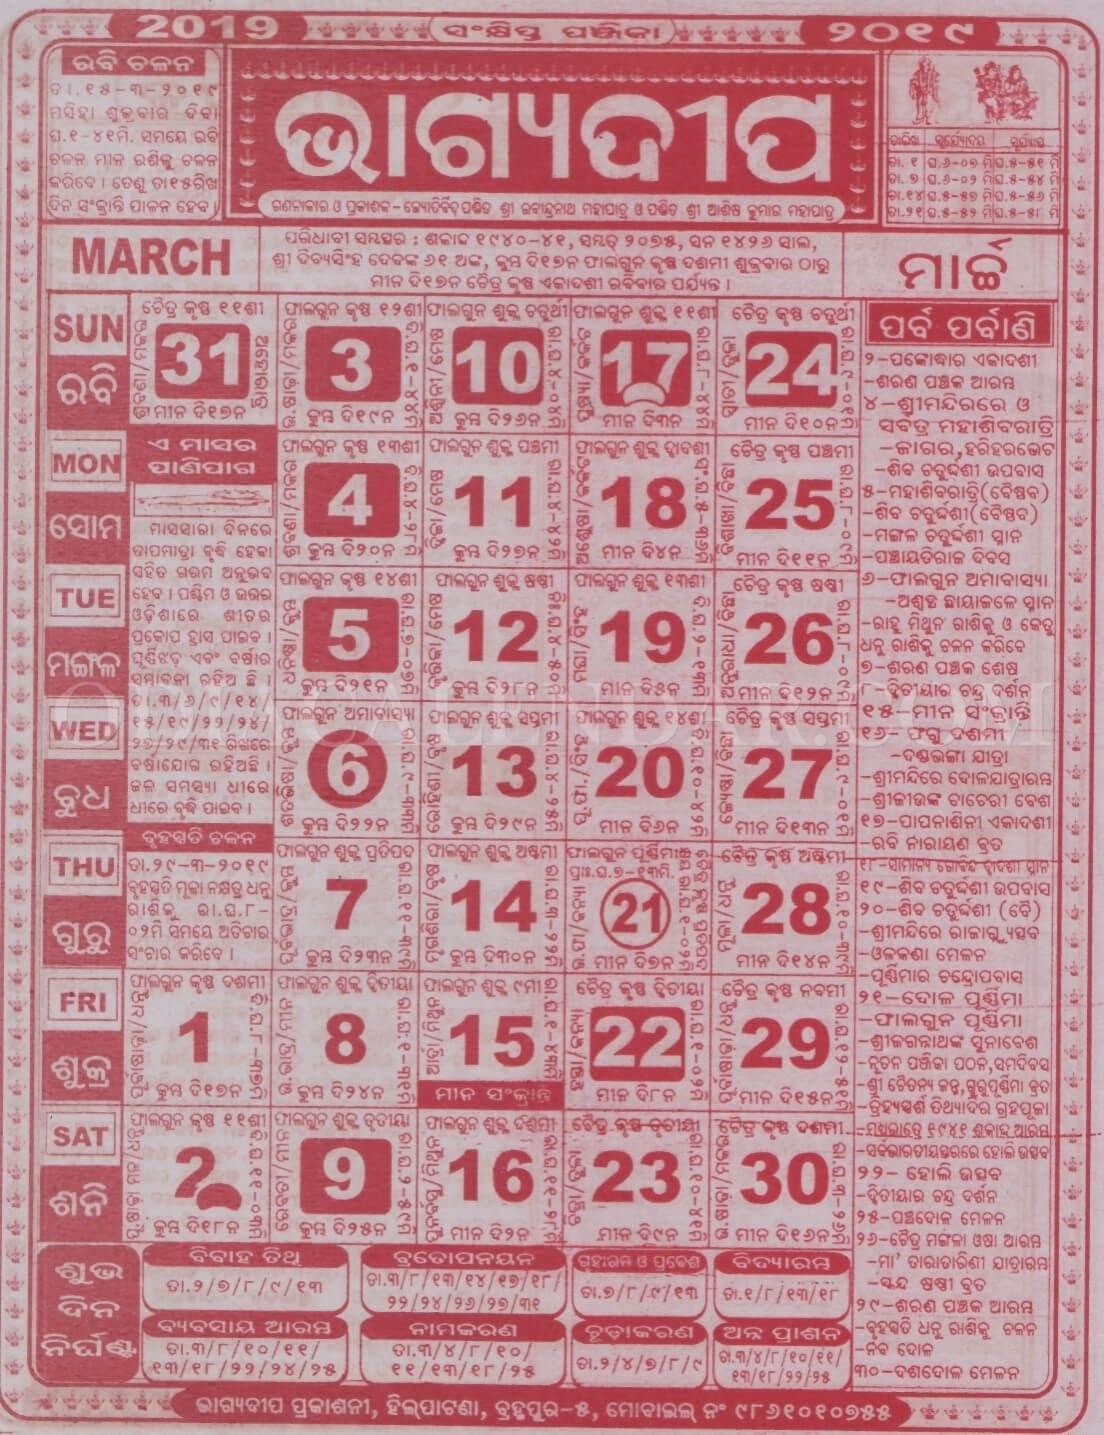 Bhagyadeep Calendar March 2019 | Cleader 2019 | Calendar, Calendar Calendar 2019 App